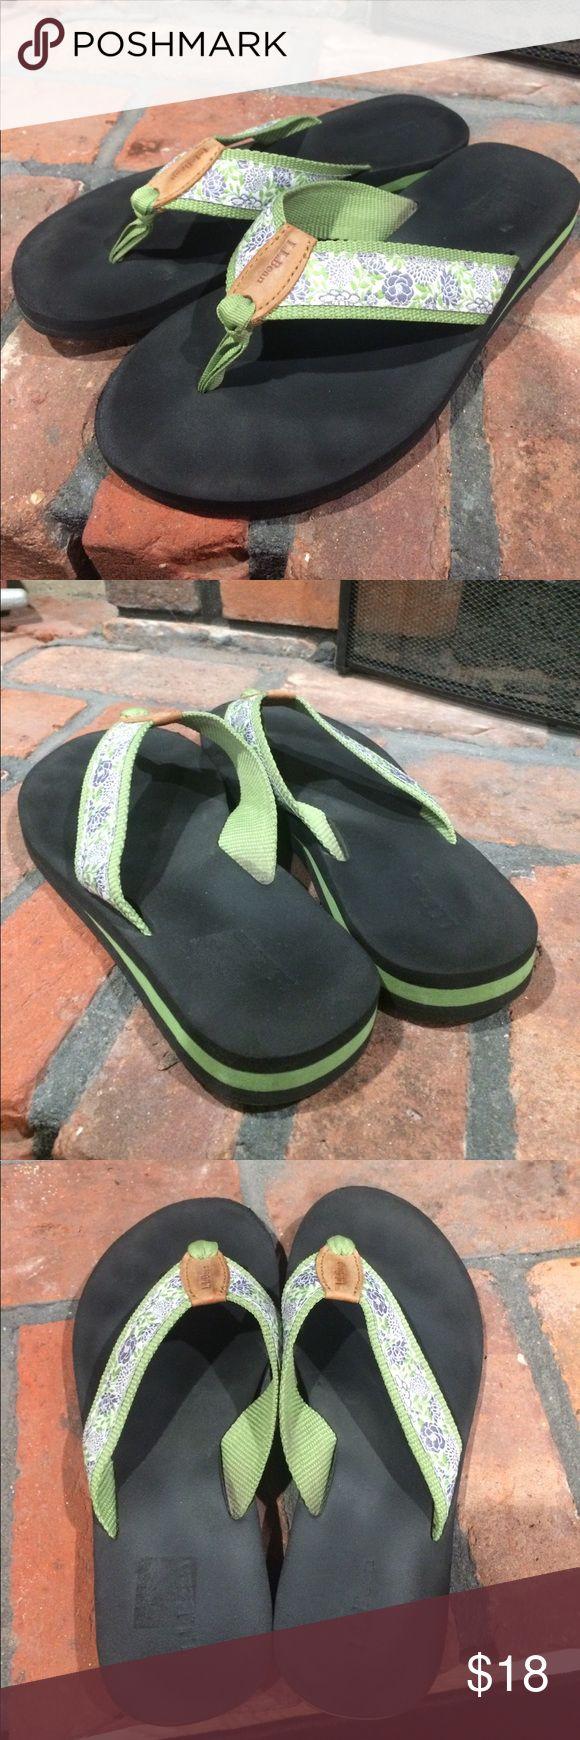 L.L.Bean women's flip flops size 8 L.L.Bean women's flip flops size 8.  Cute green and blue and white floral print flip flops.  Very good condition.  Light use. L.L. Bean Shoes Sandals